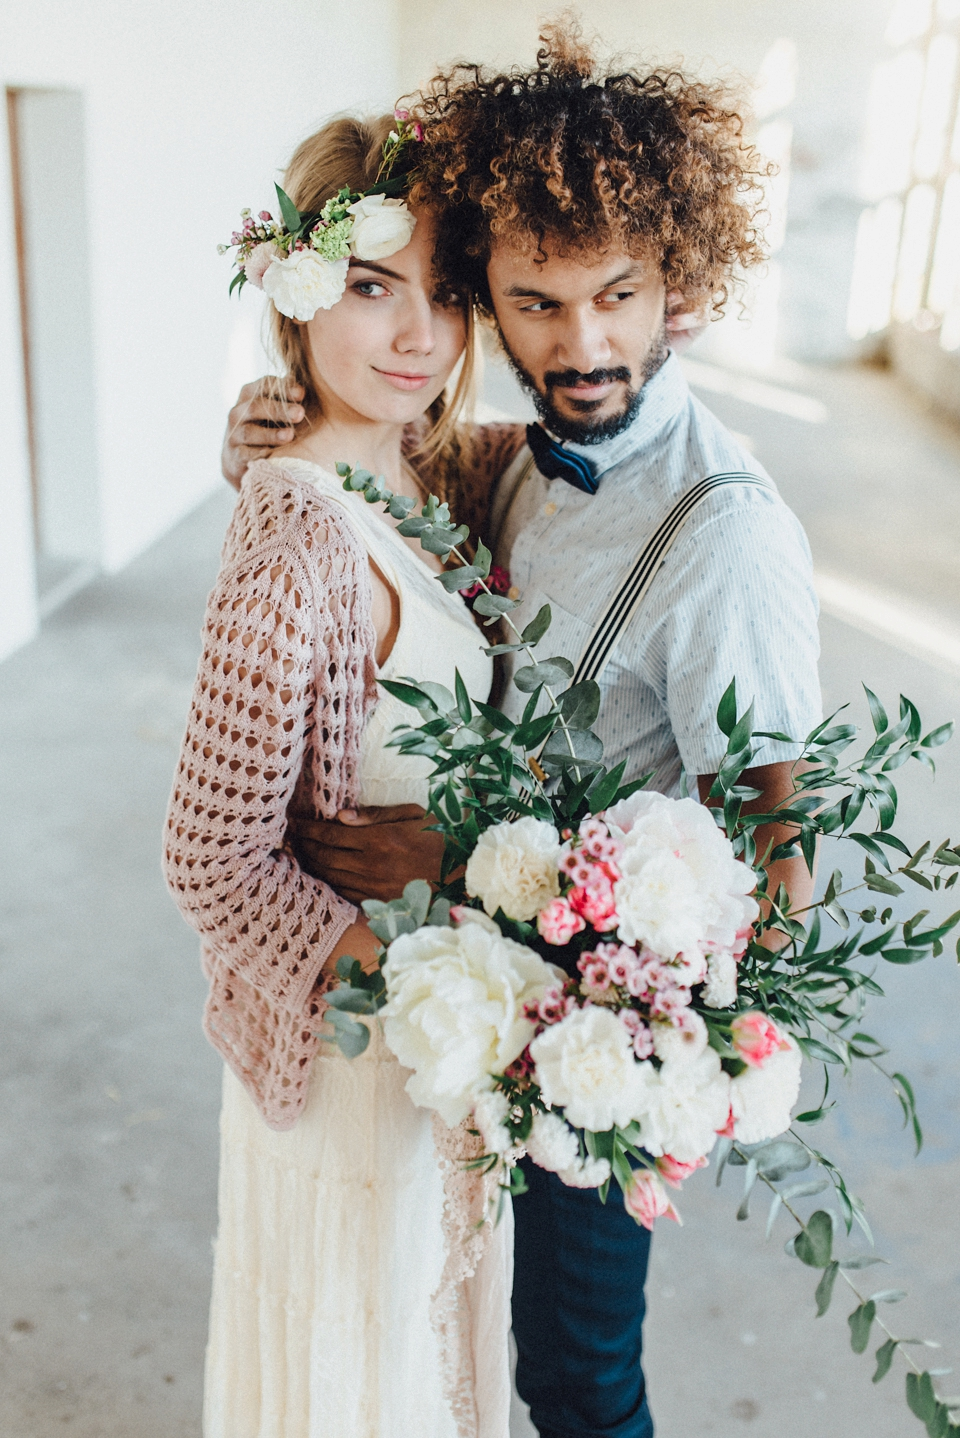 wedding-photographer-germany-international_0913 Kelly & Marcel. Ergebnisse vom Videoworkshop am 13.03.2016wedding photographer germany international 0913